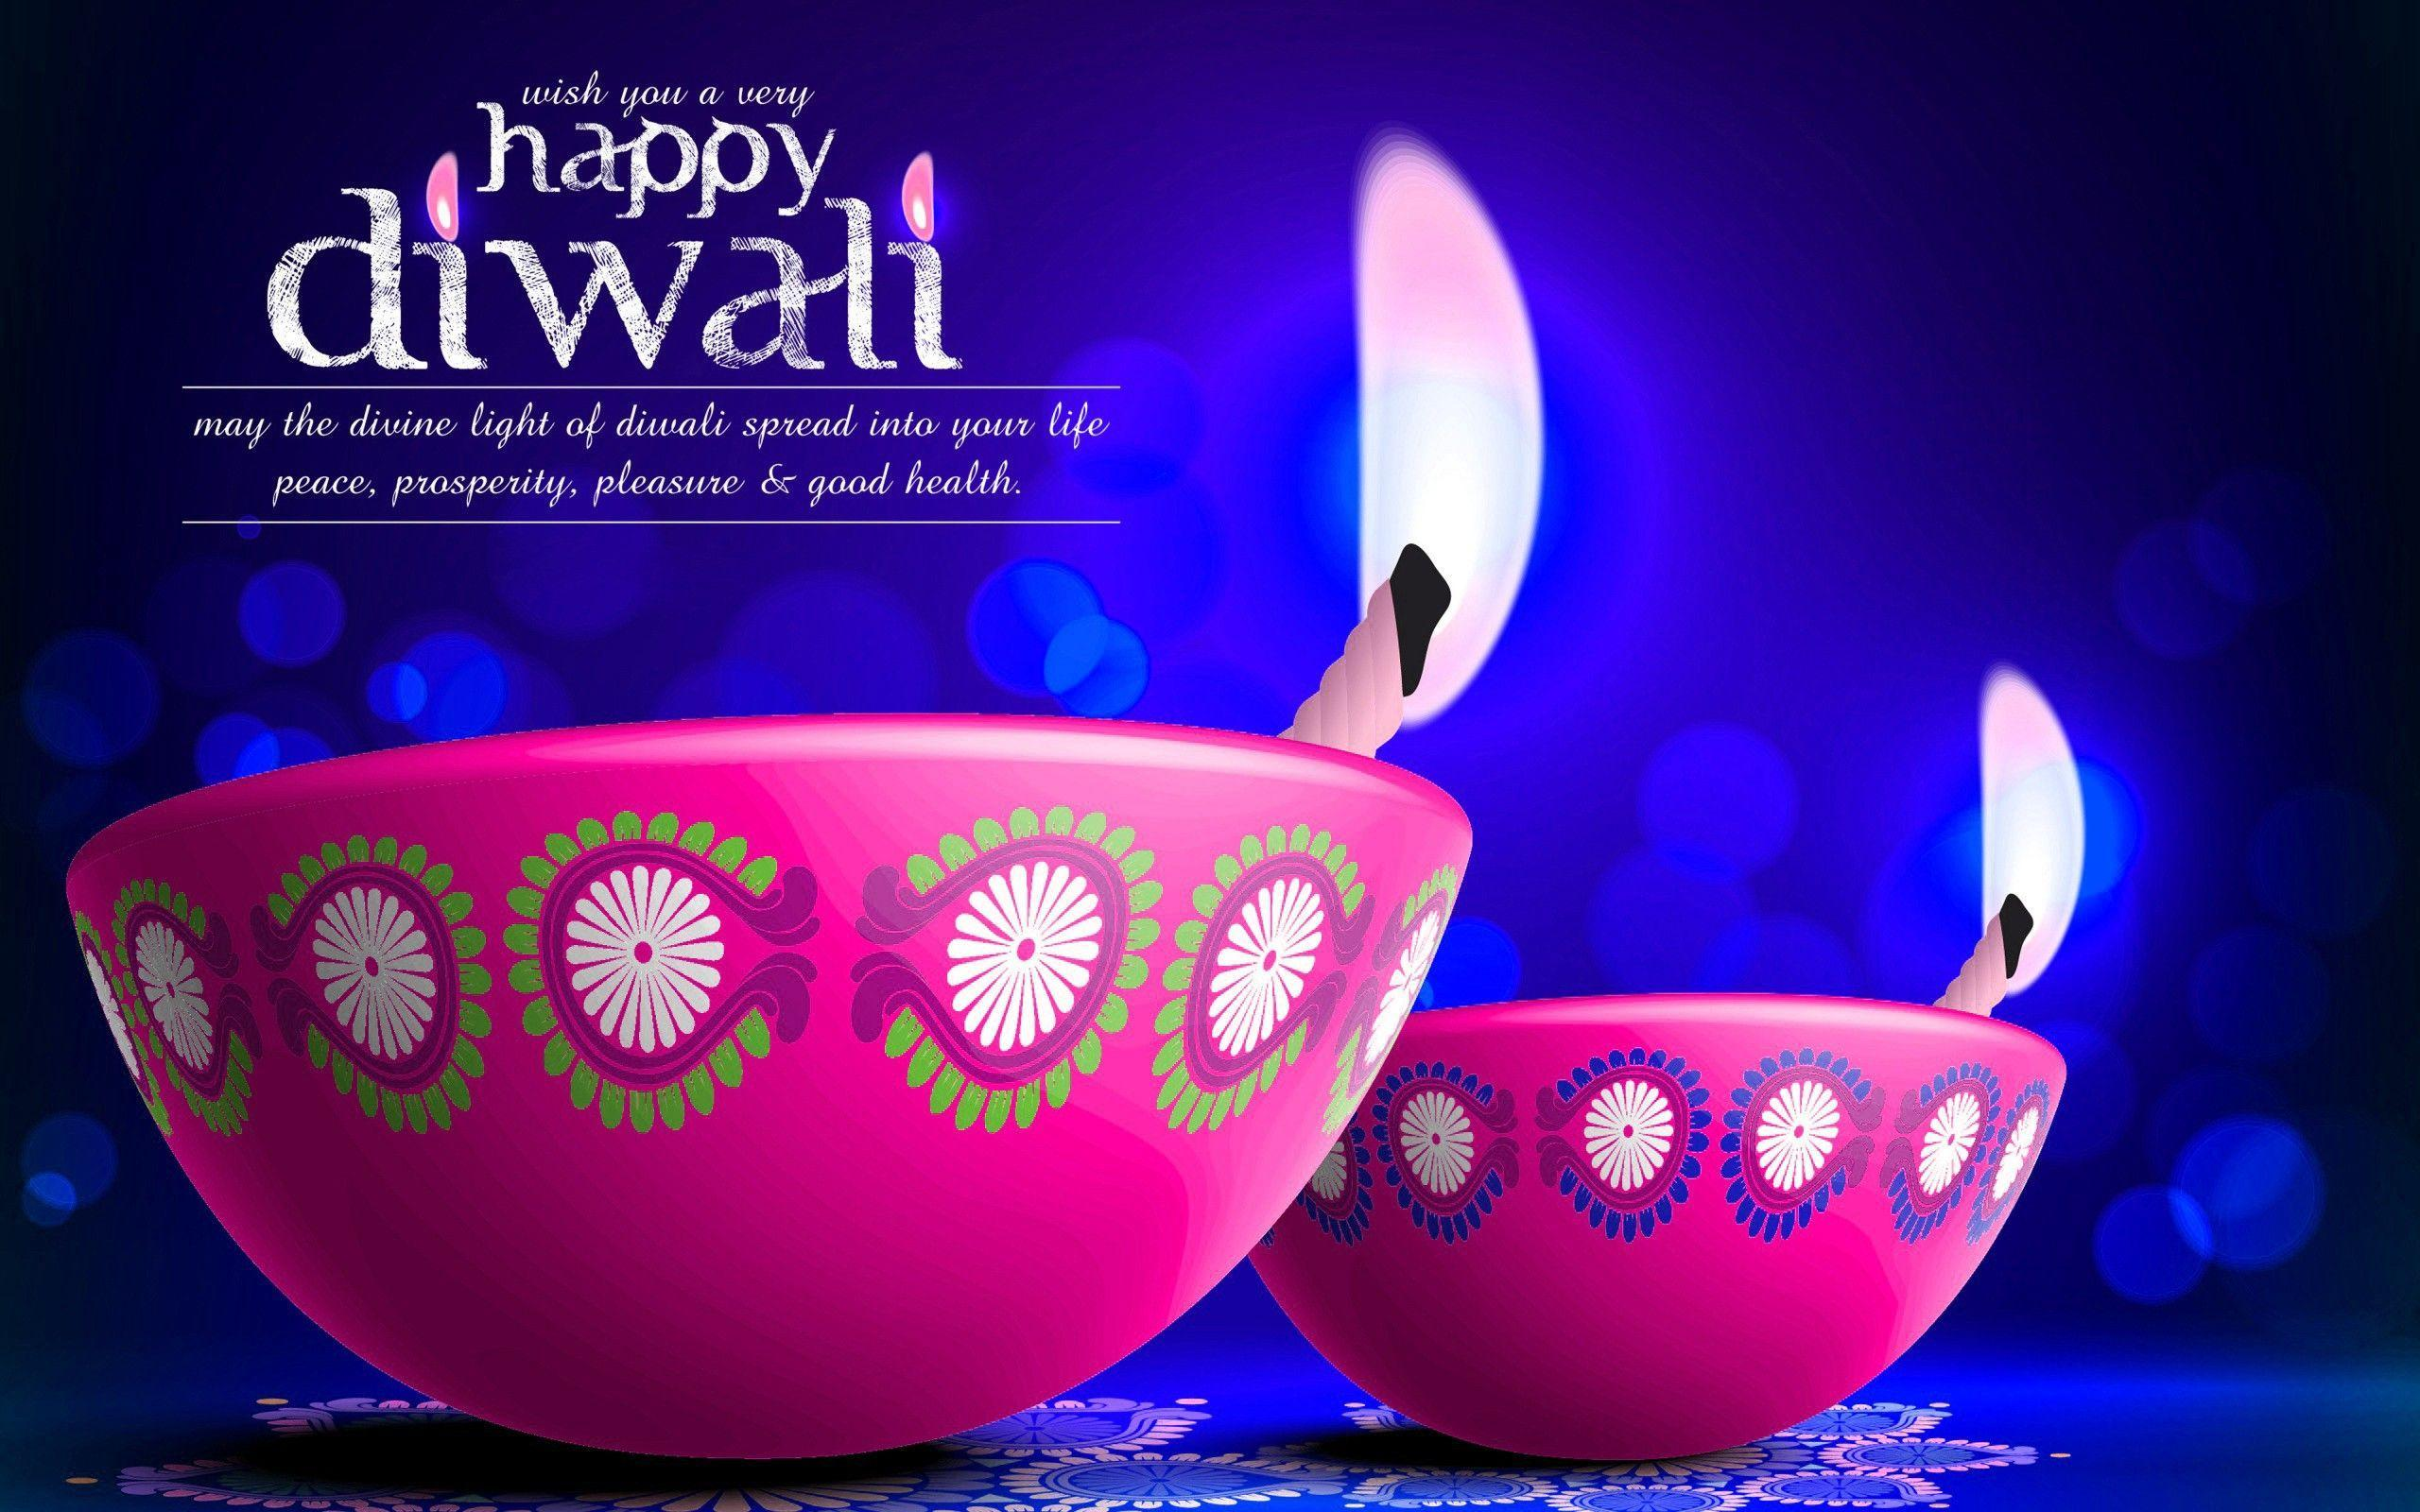 Diwali Wallpaper - Download Happy Diwali Pictures 2016 HD Wallpapers